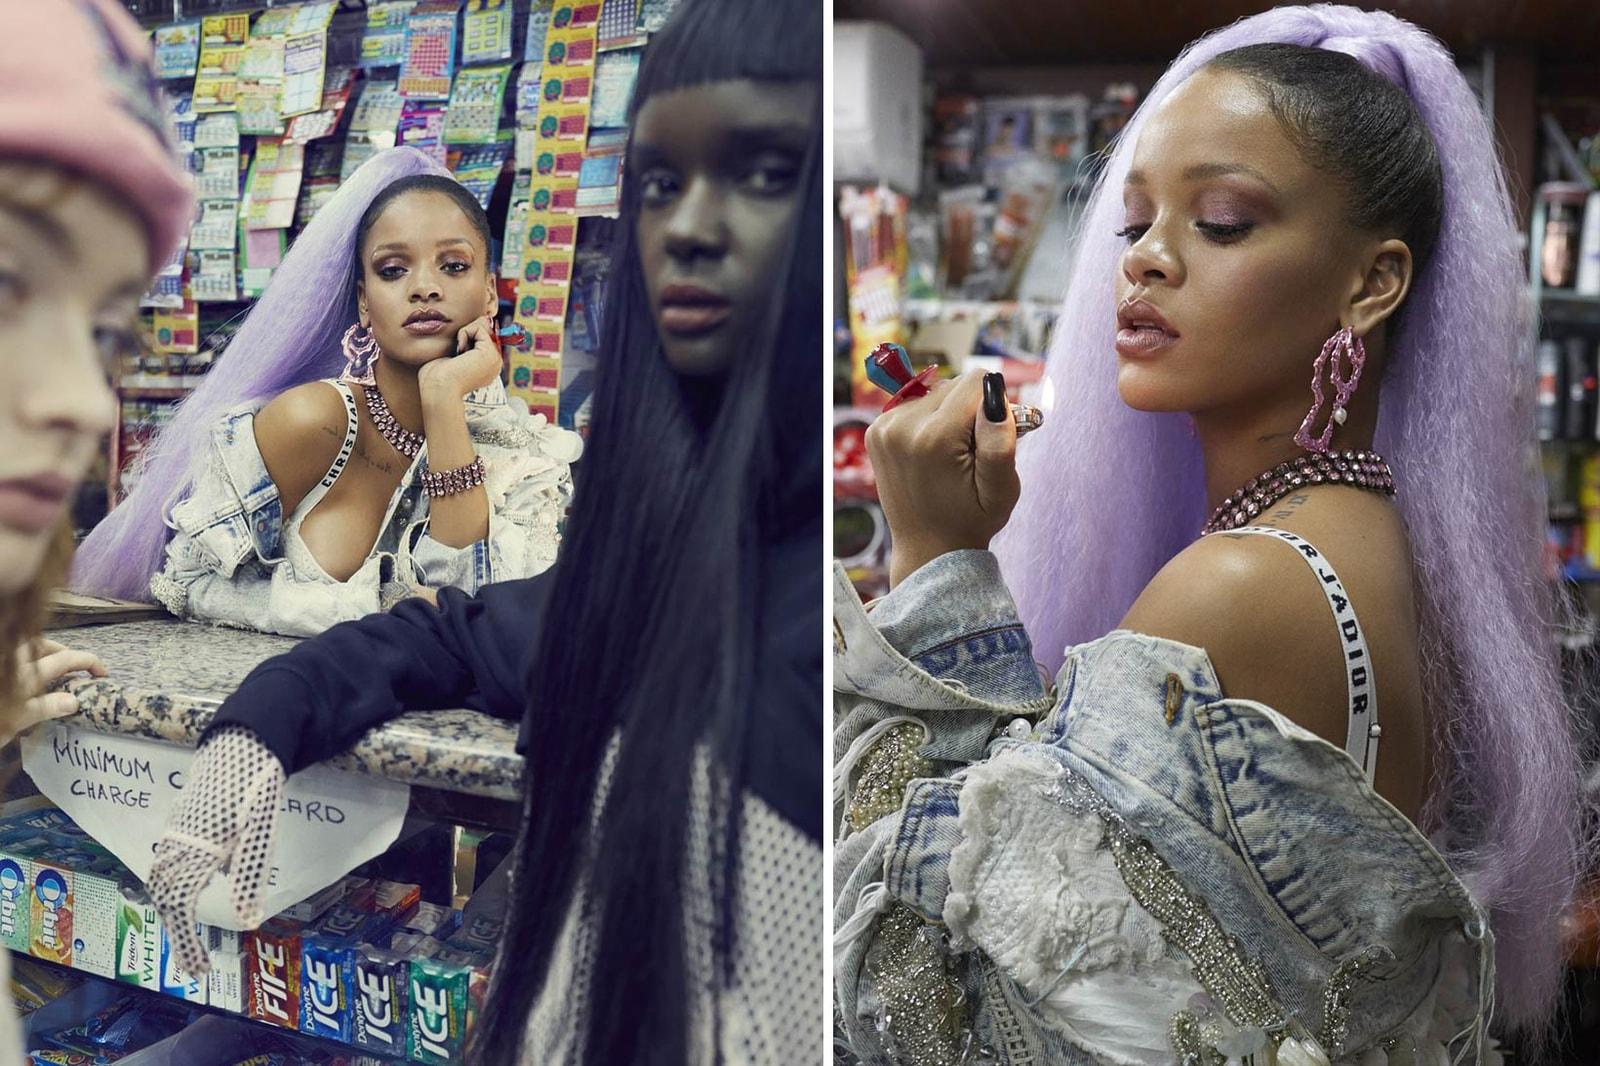 Chrishabana Good Girl Bad Girl Bamboo Earrings Pink Rihanna Paper Magazine